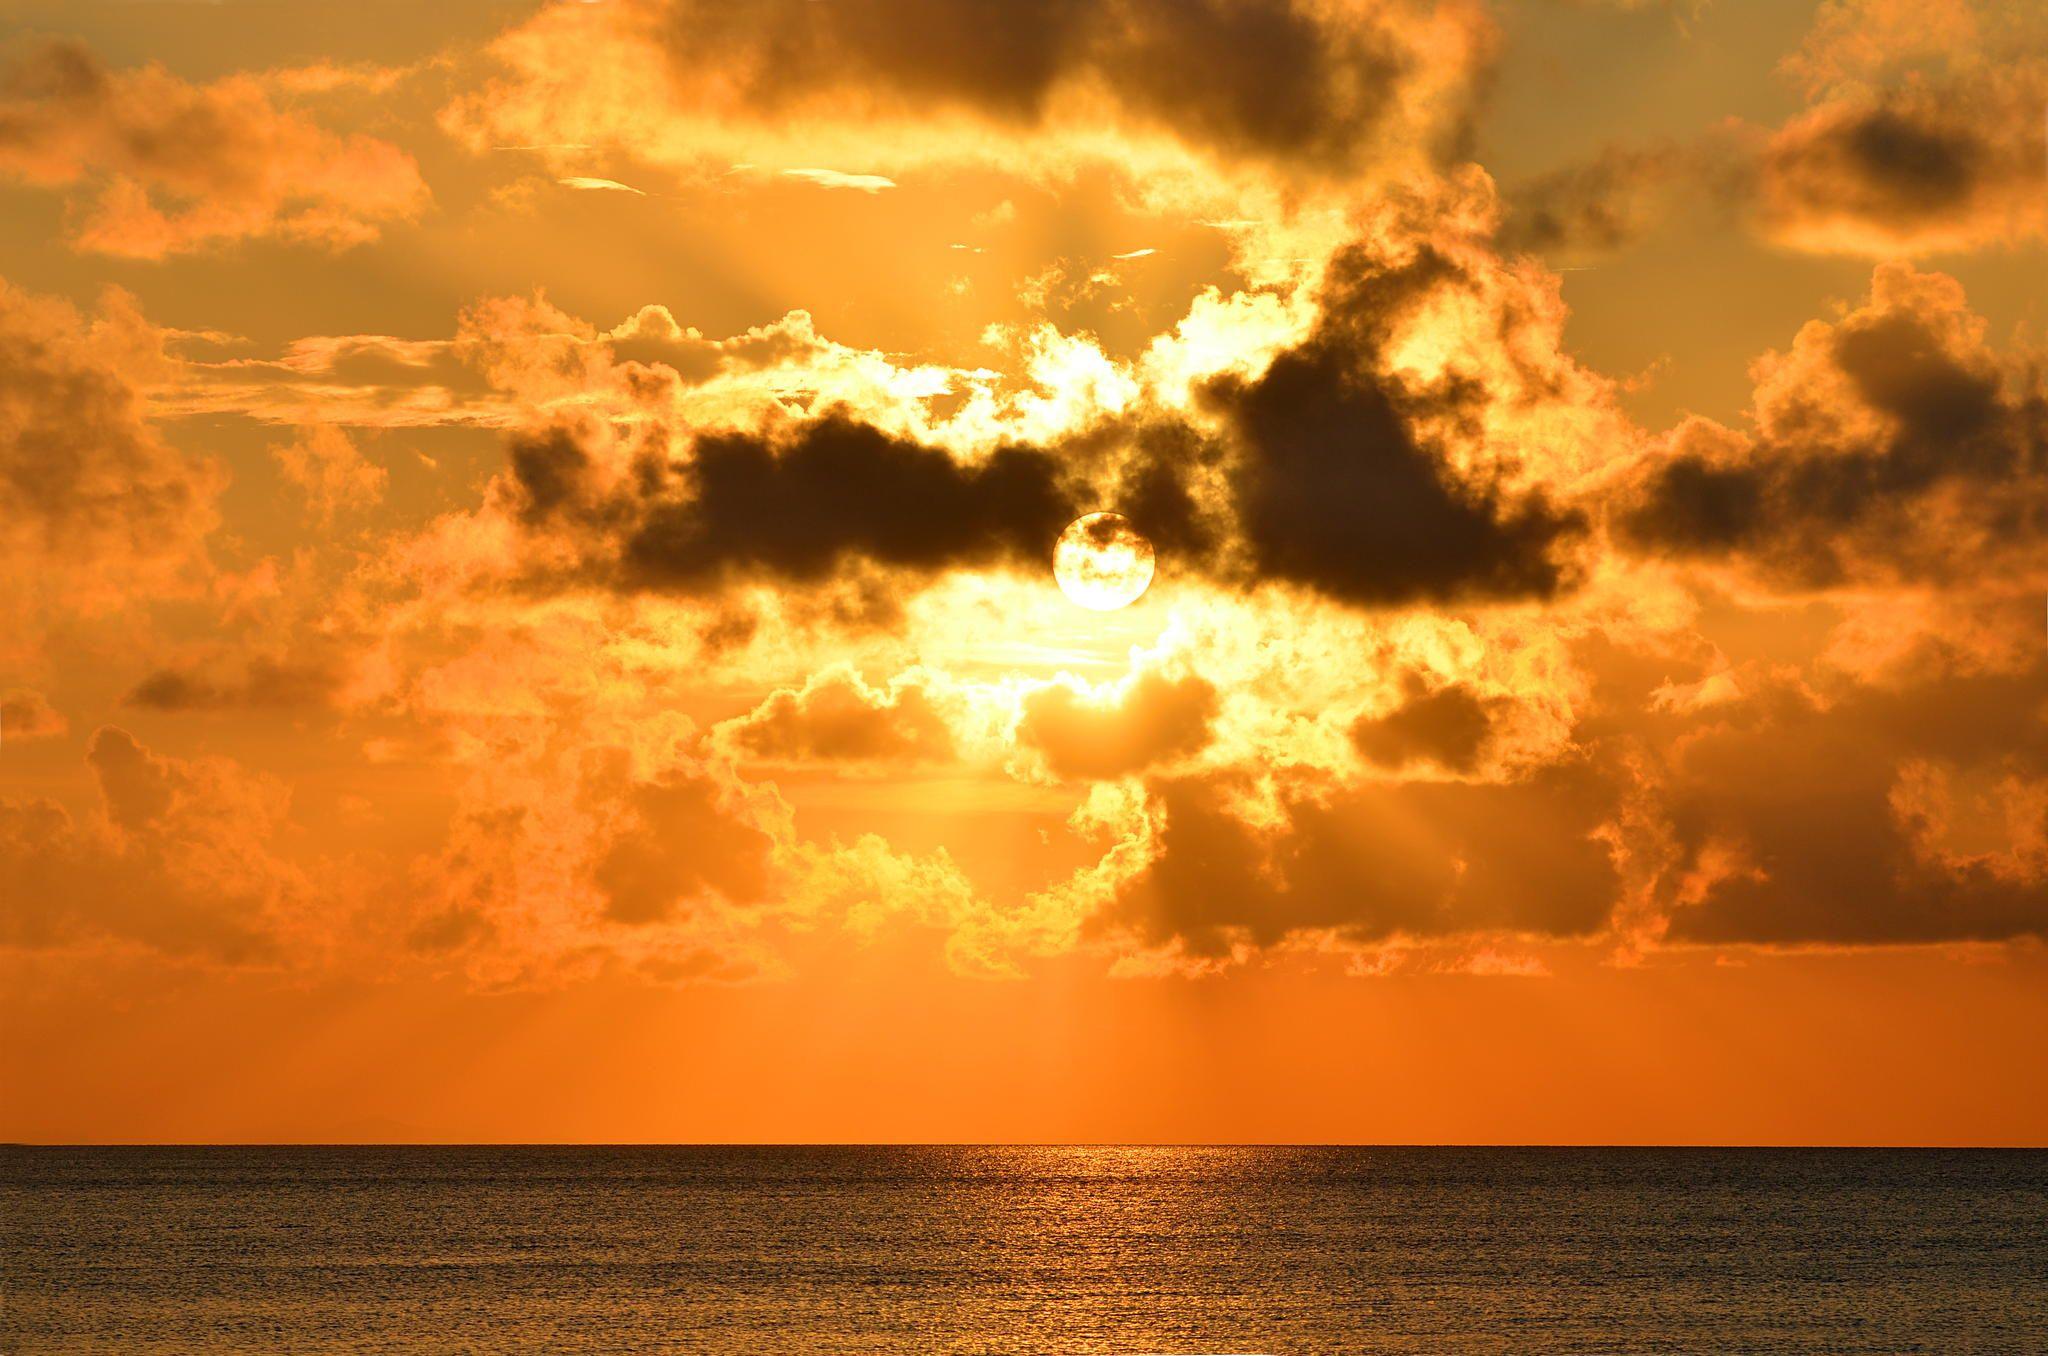 Photograph sun by Manolis Smalios on 500px